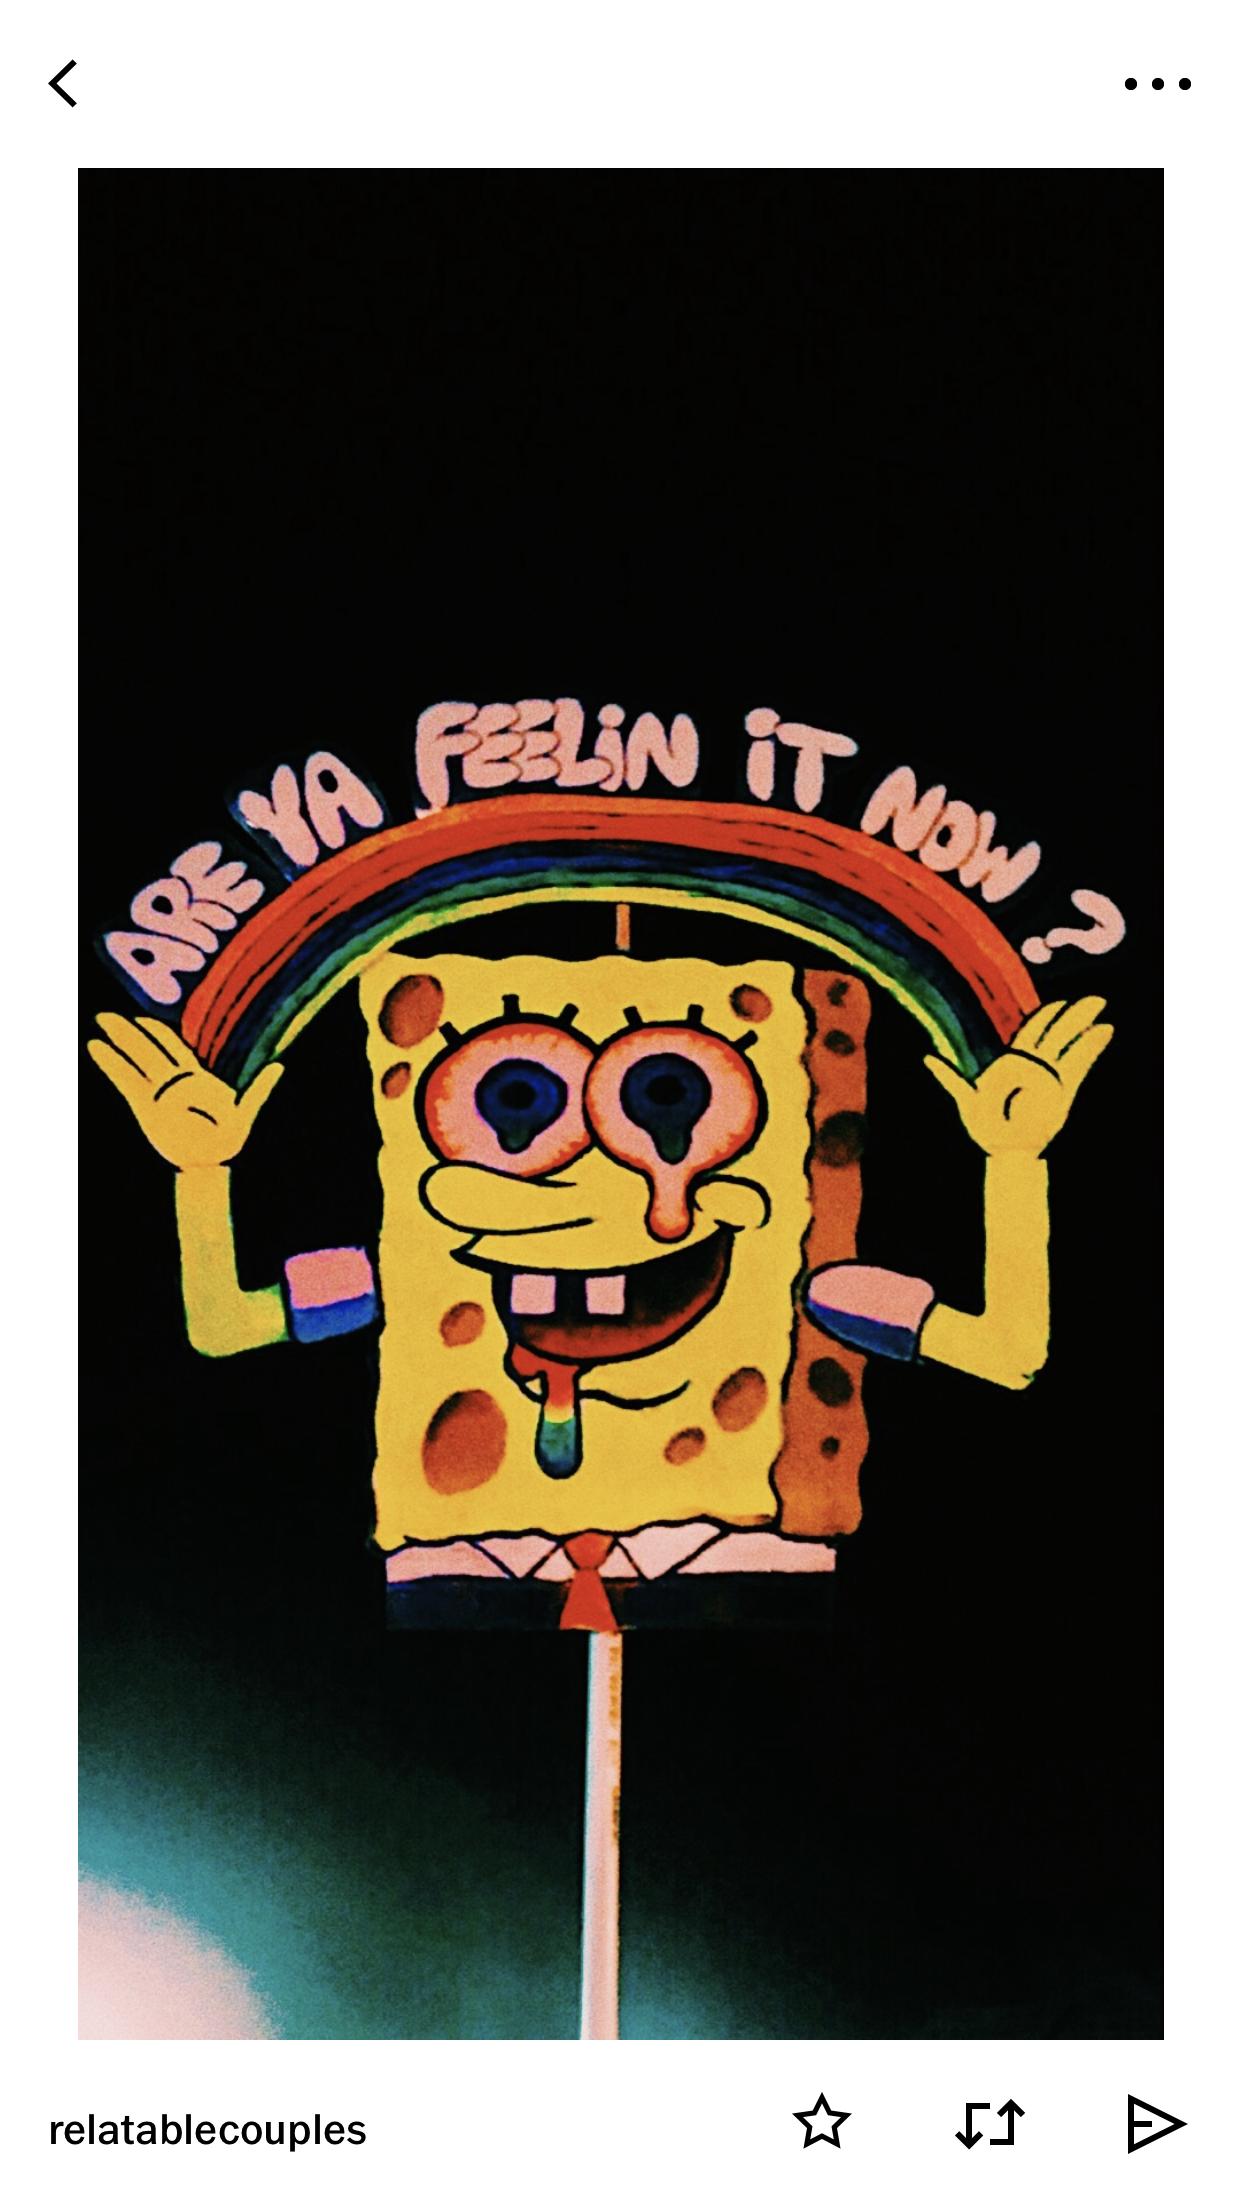 Are You Feeling It Now Spongebob Painting Spongebob Drawings Spongebob Wallpaper